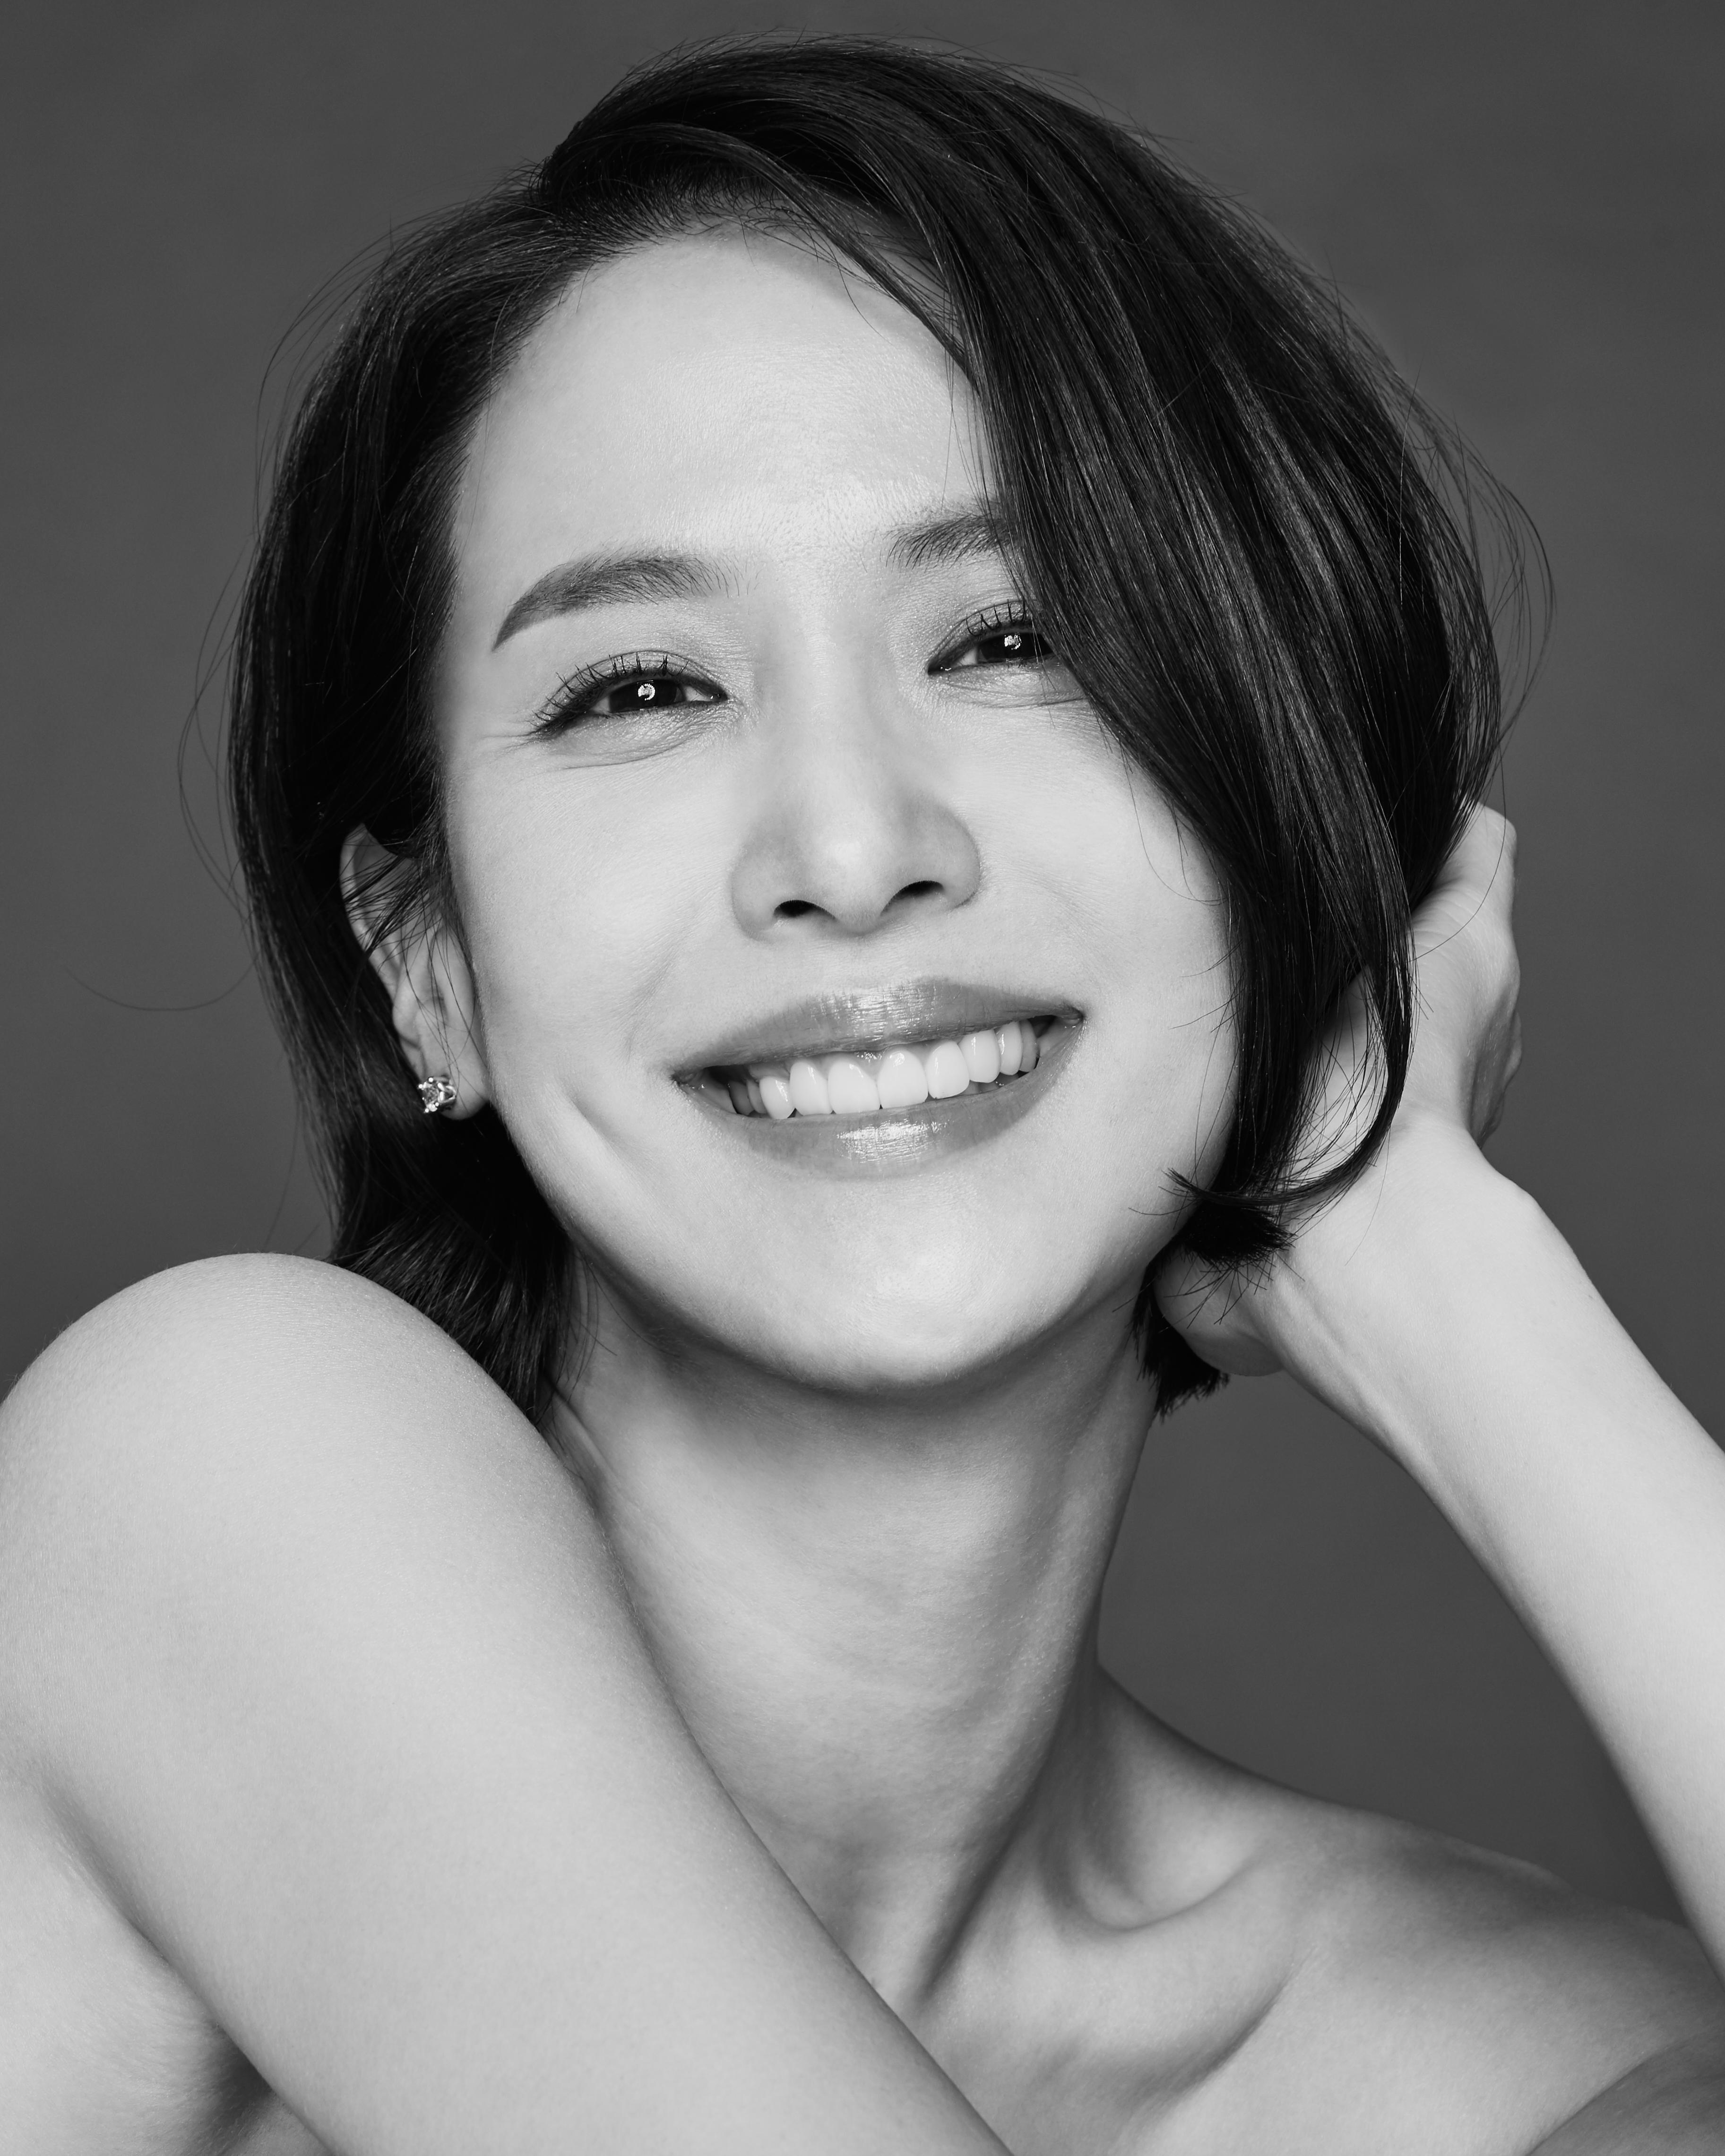 Yeo-jeong Jo - IMDb